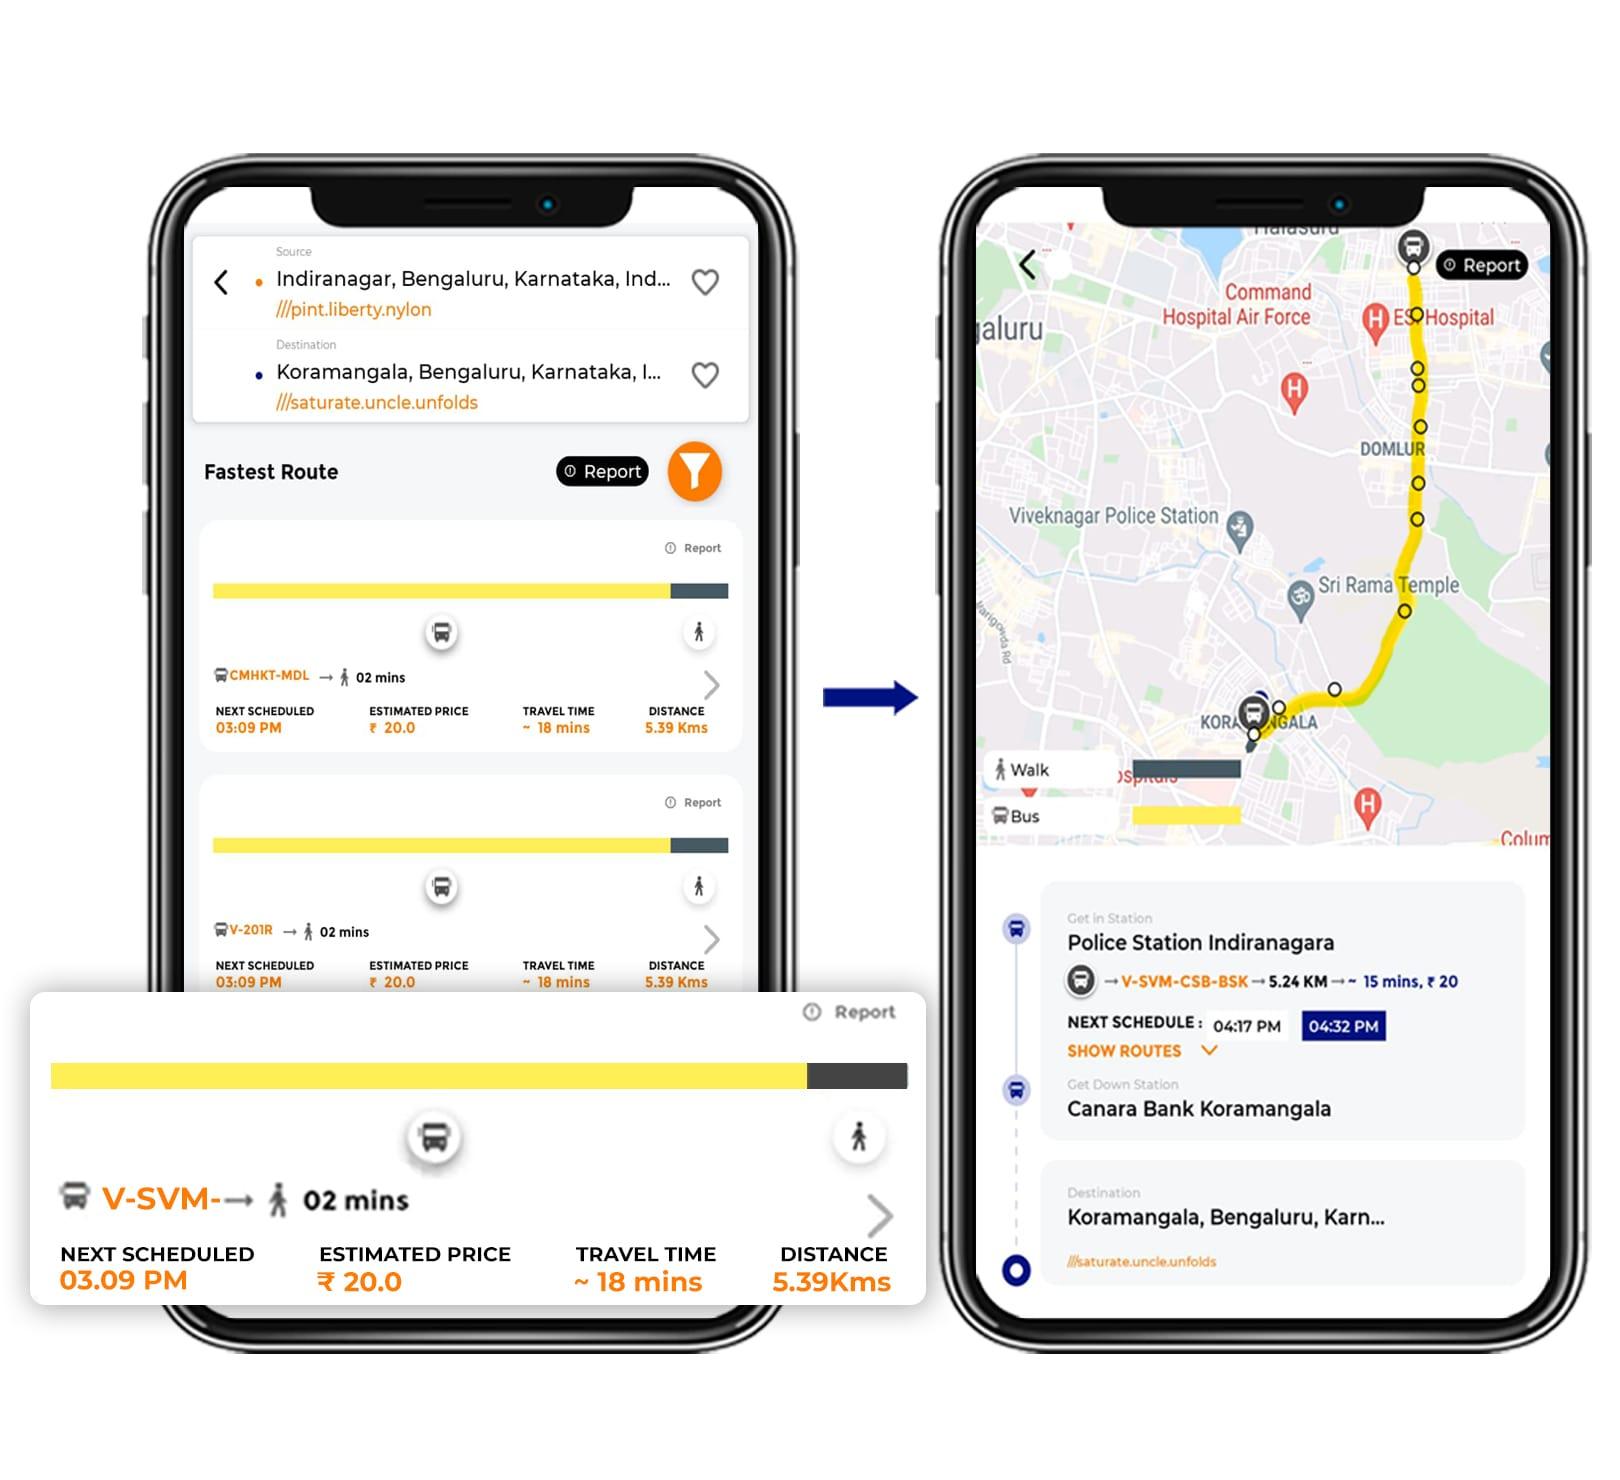 Tummoc, Tummoc app, Public transportation, Indiranagar, Kormangala